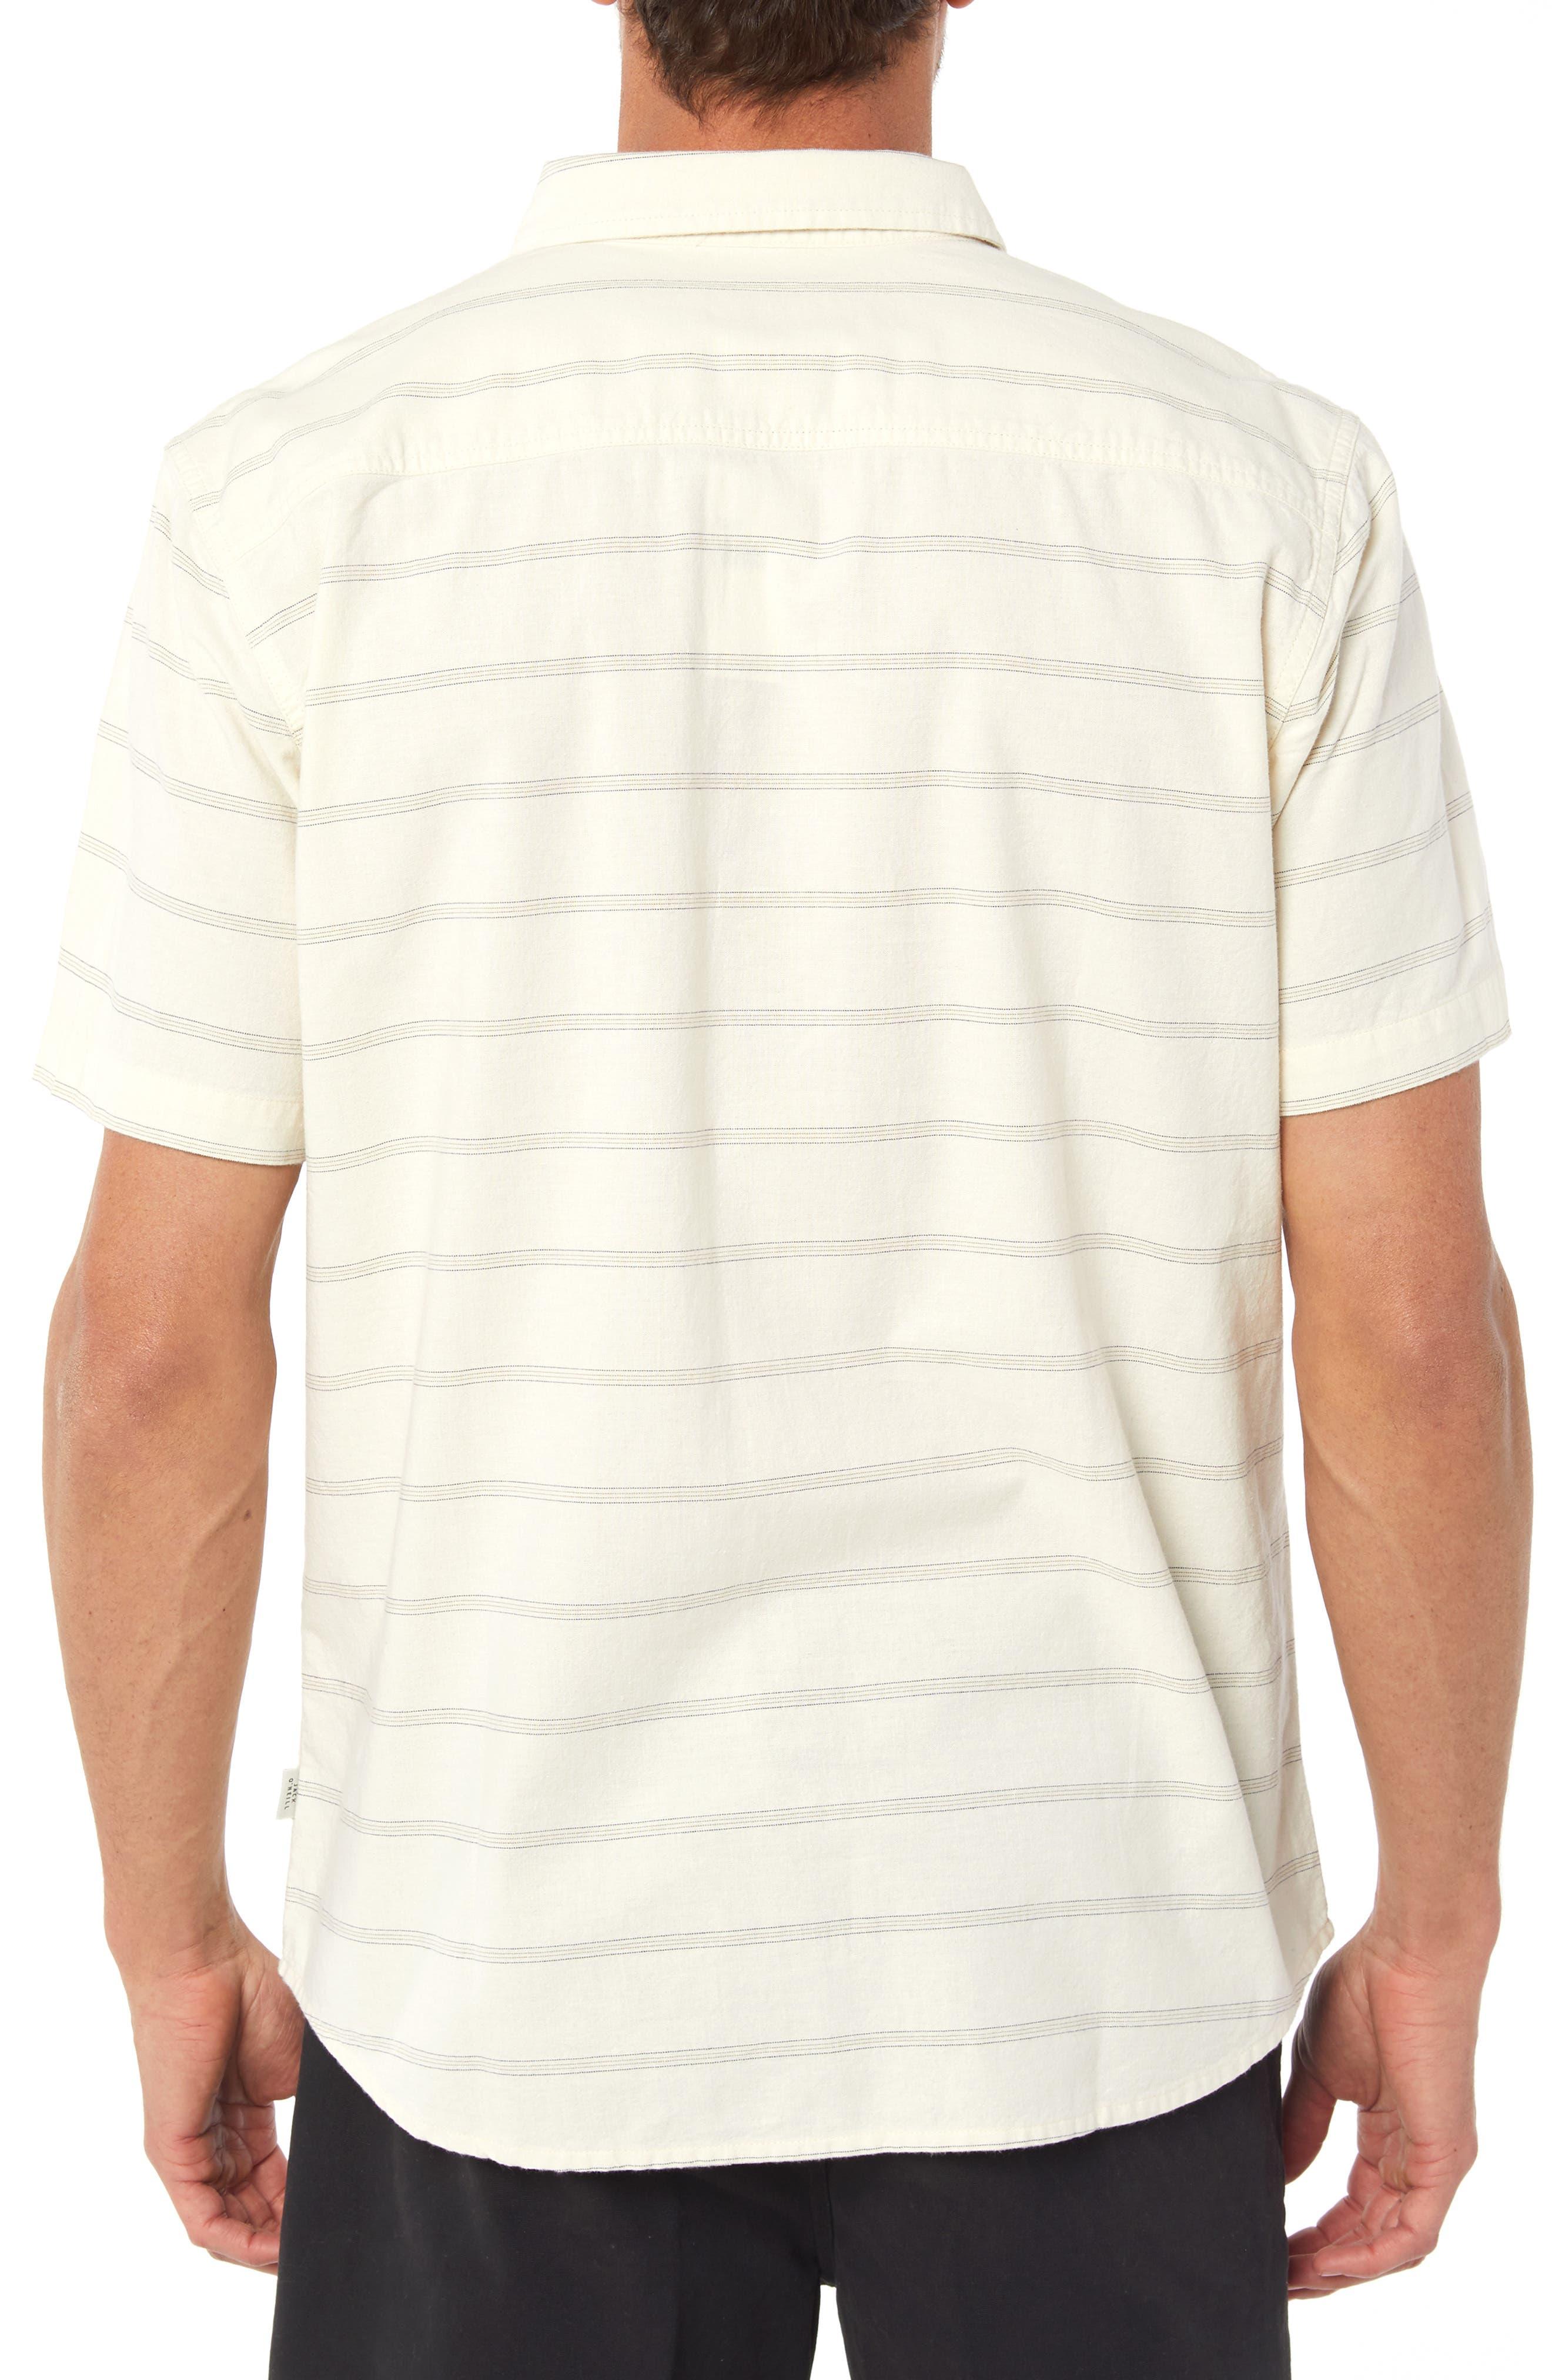 Tampico Regular Fit Sport Shirt,                             Alternate thumbnail 2, color,                             109